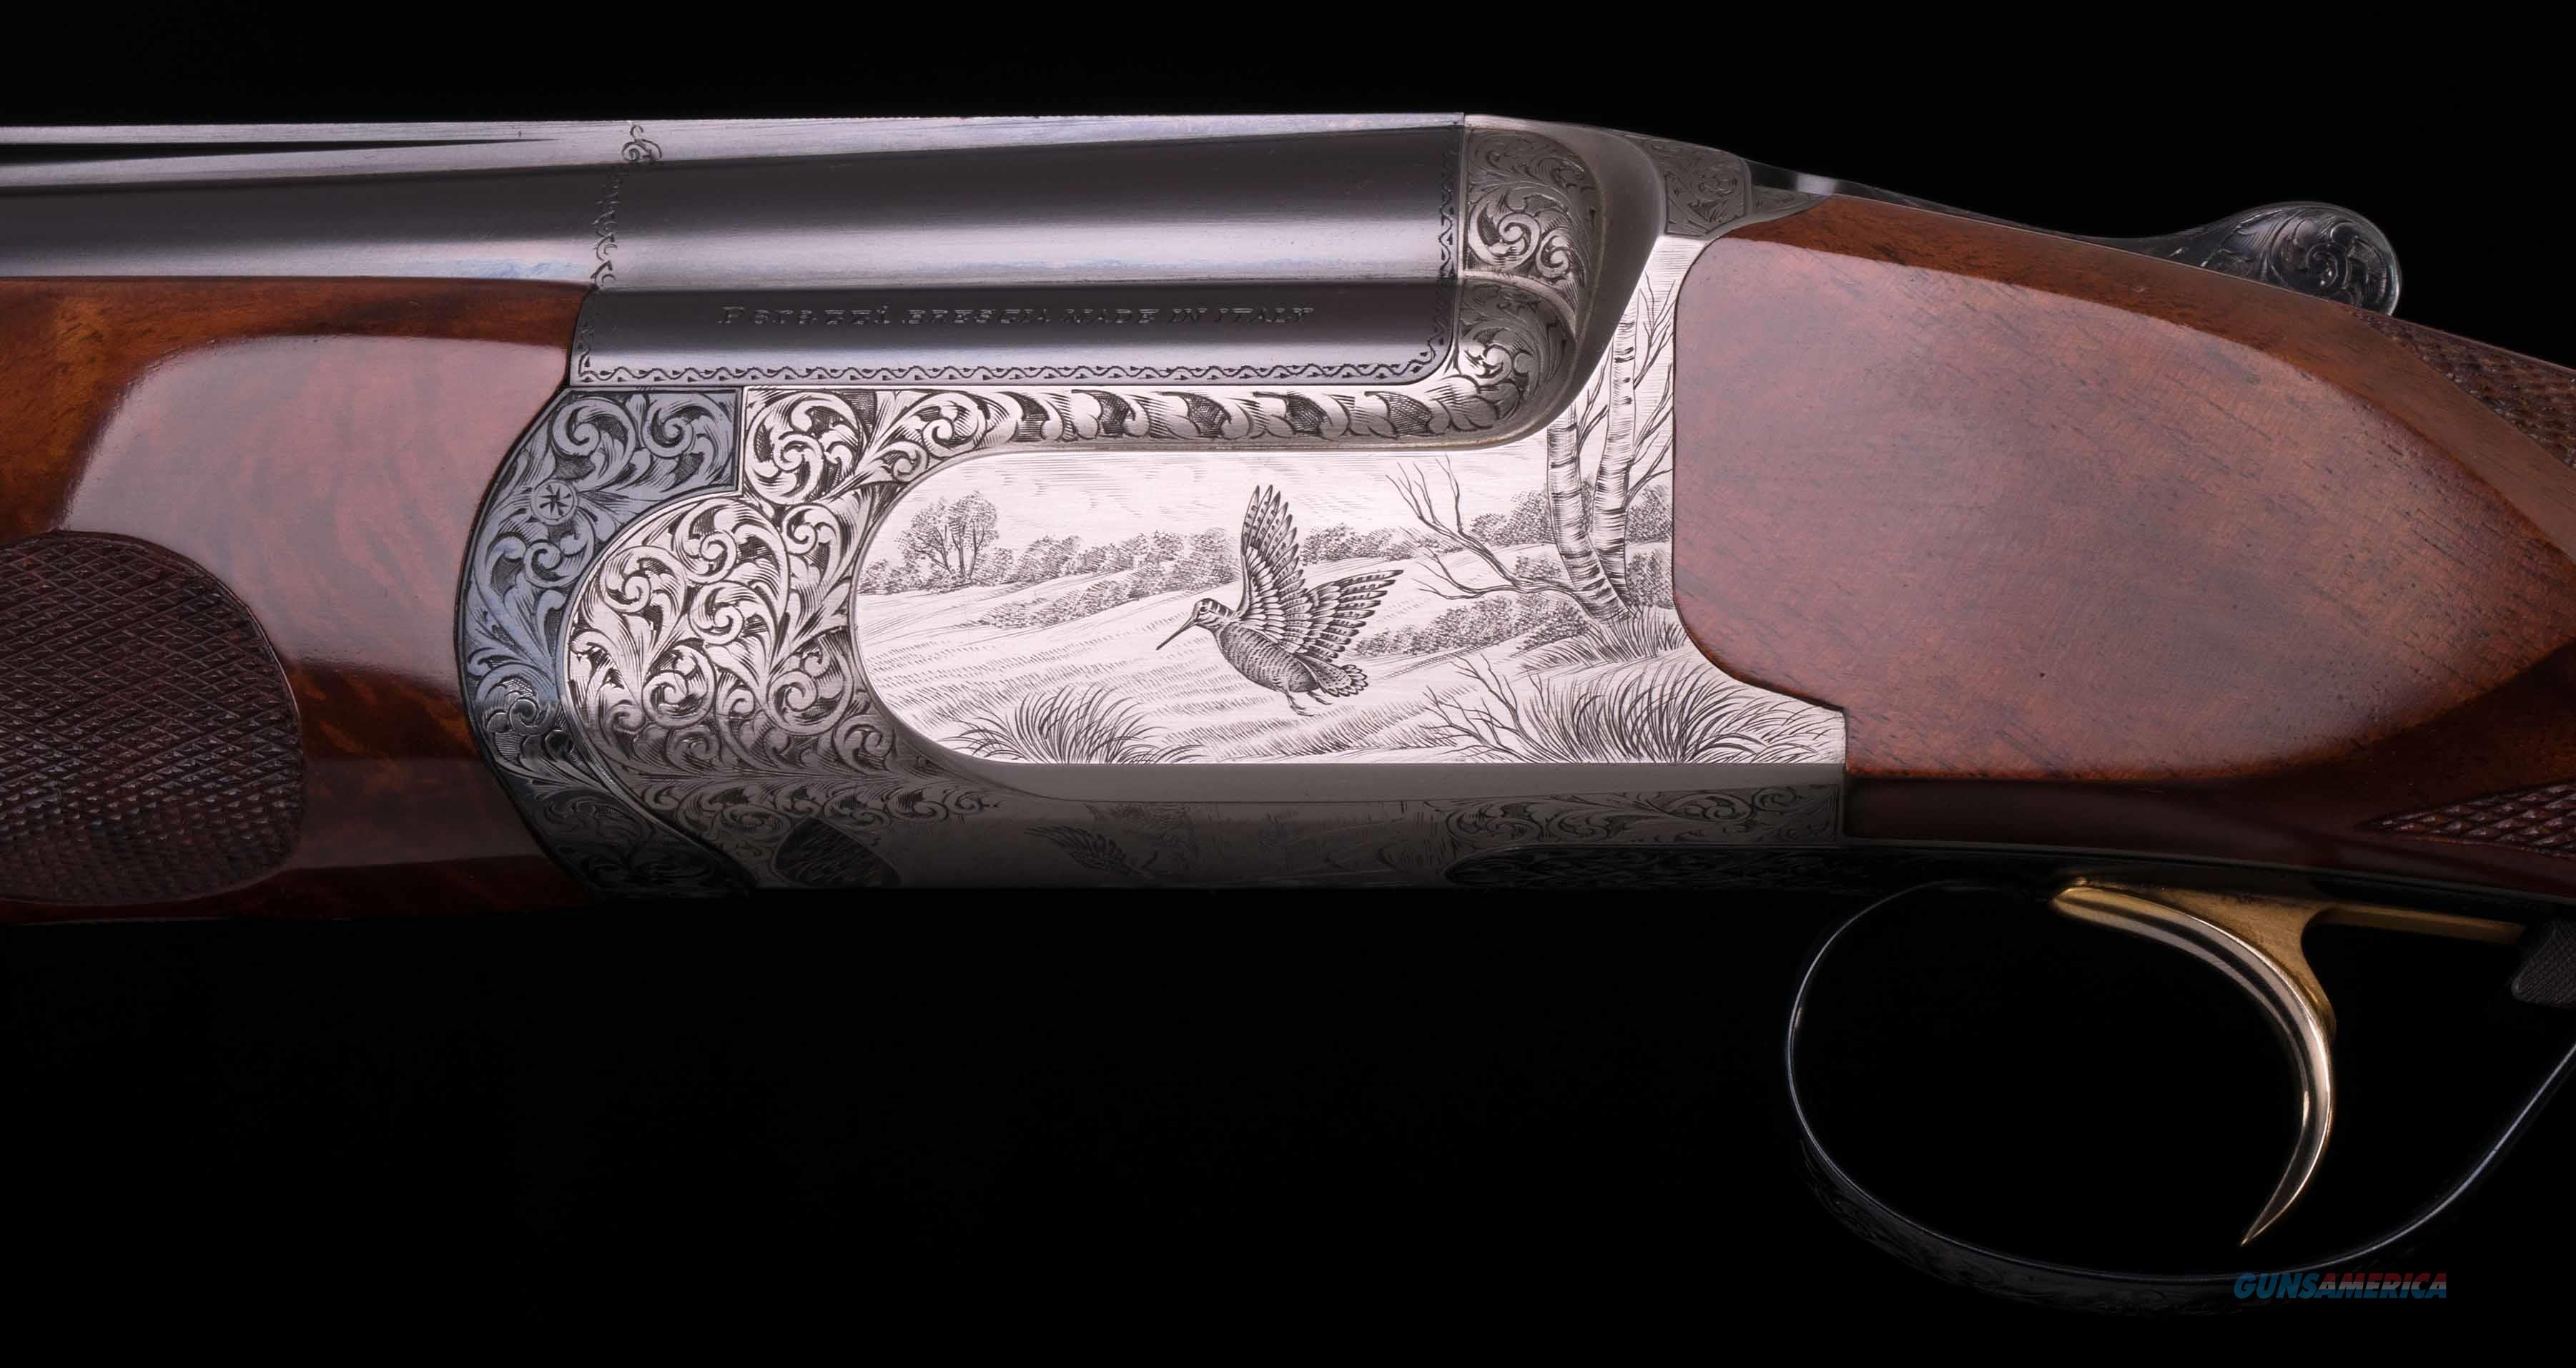 Perazzi MX8 12 Gauge - SC3,  TOM SMITH WOOD, VINTAGE FIREARMS, INC.  Guns > Shotguns > Perazzi Shotguns